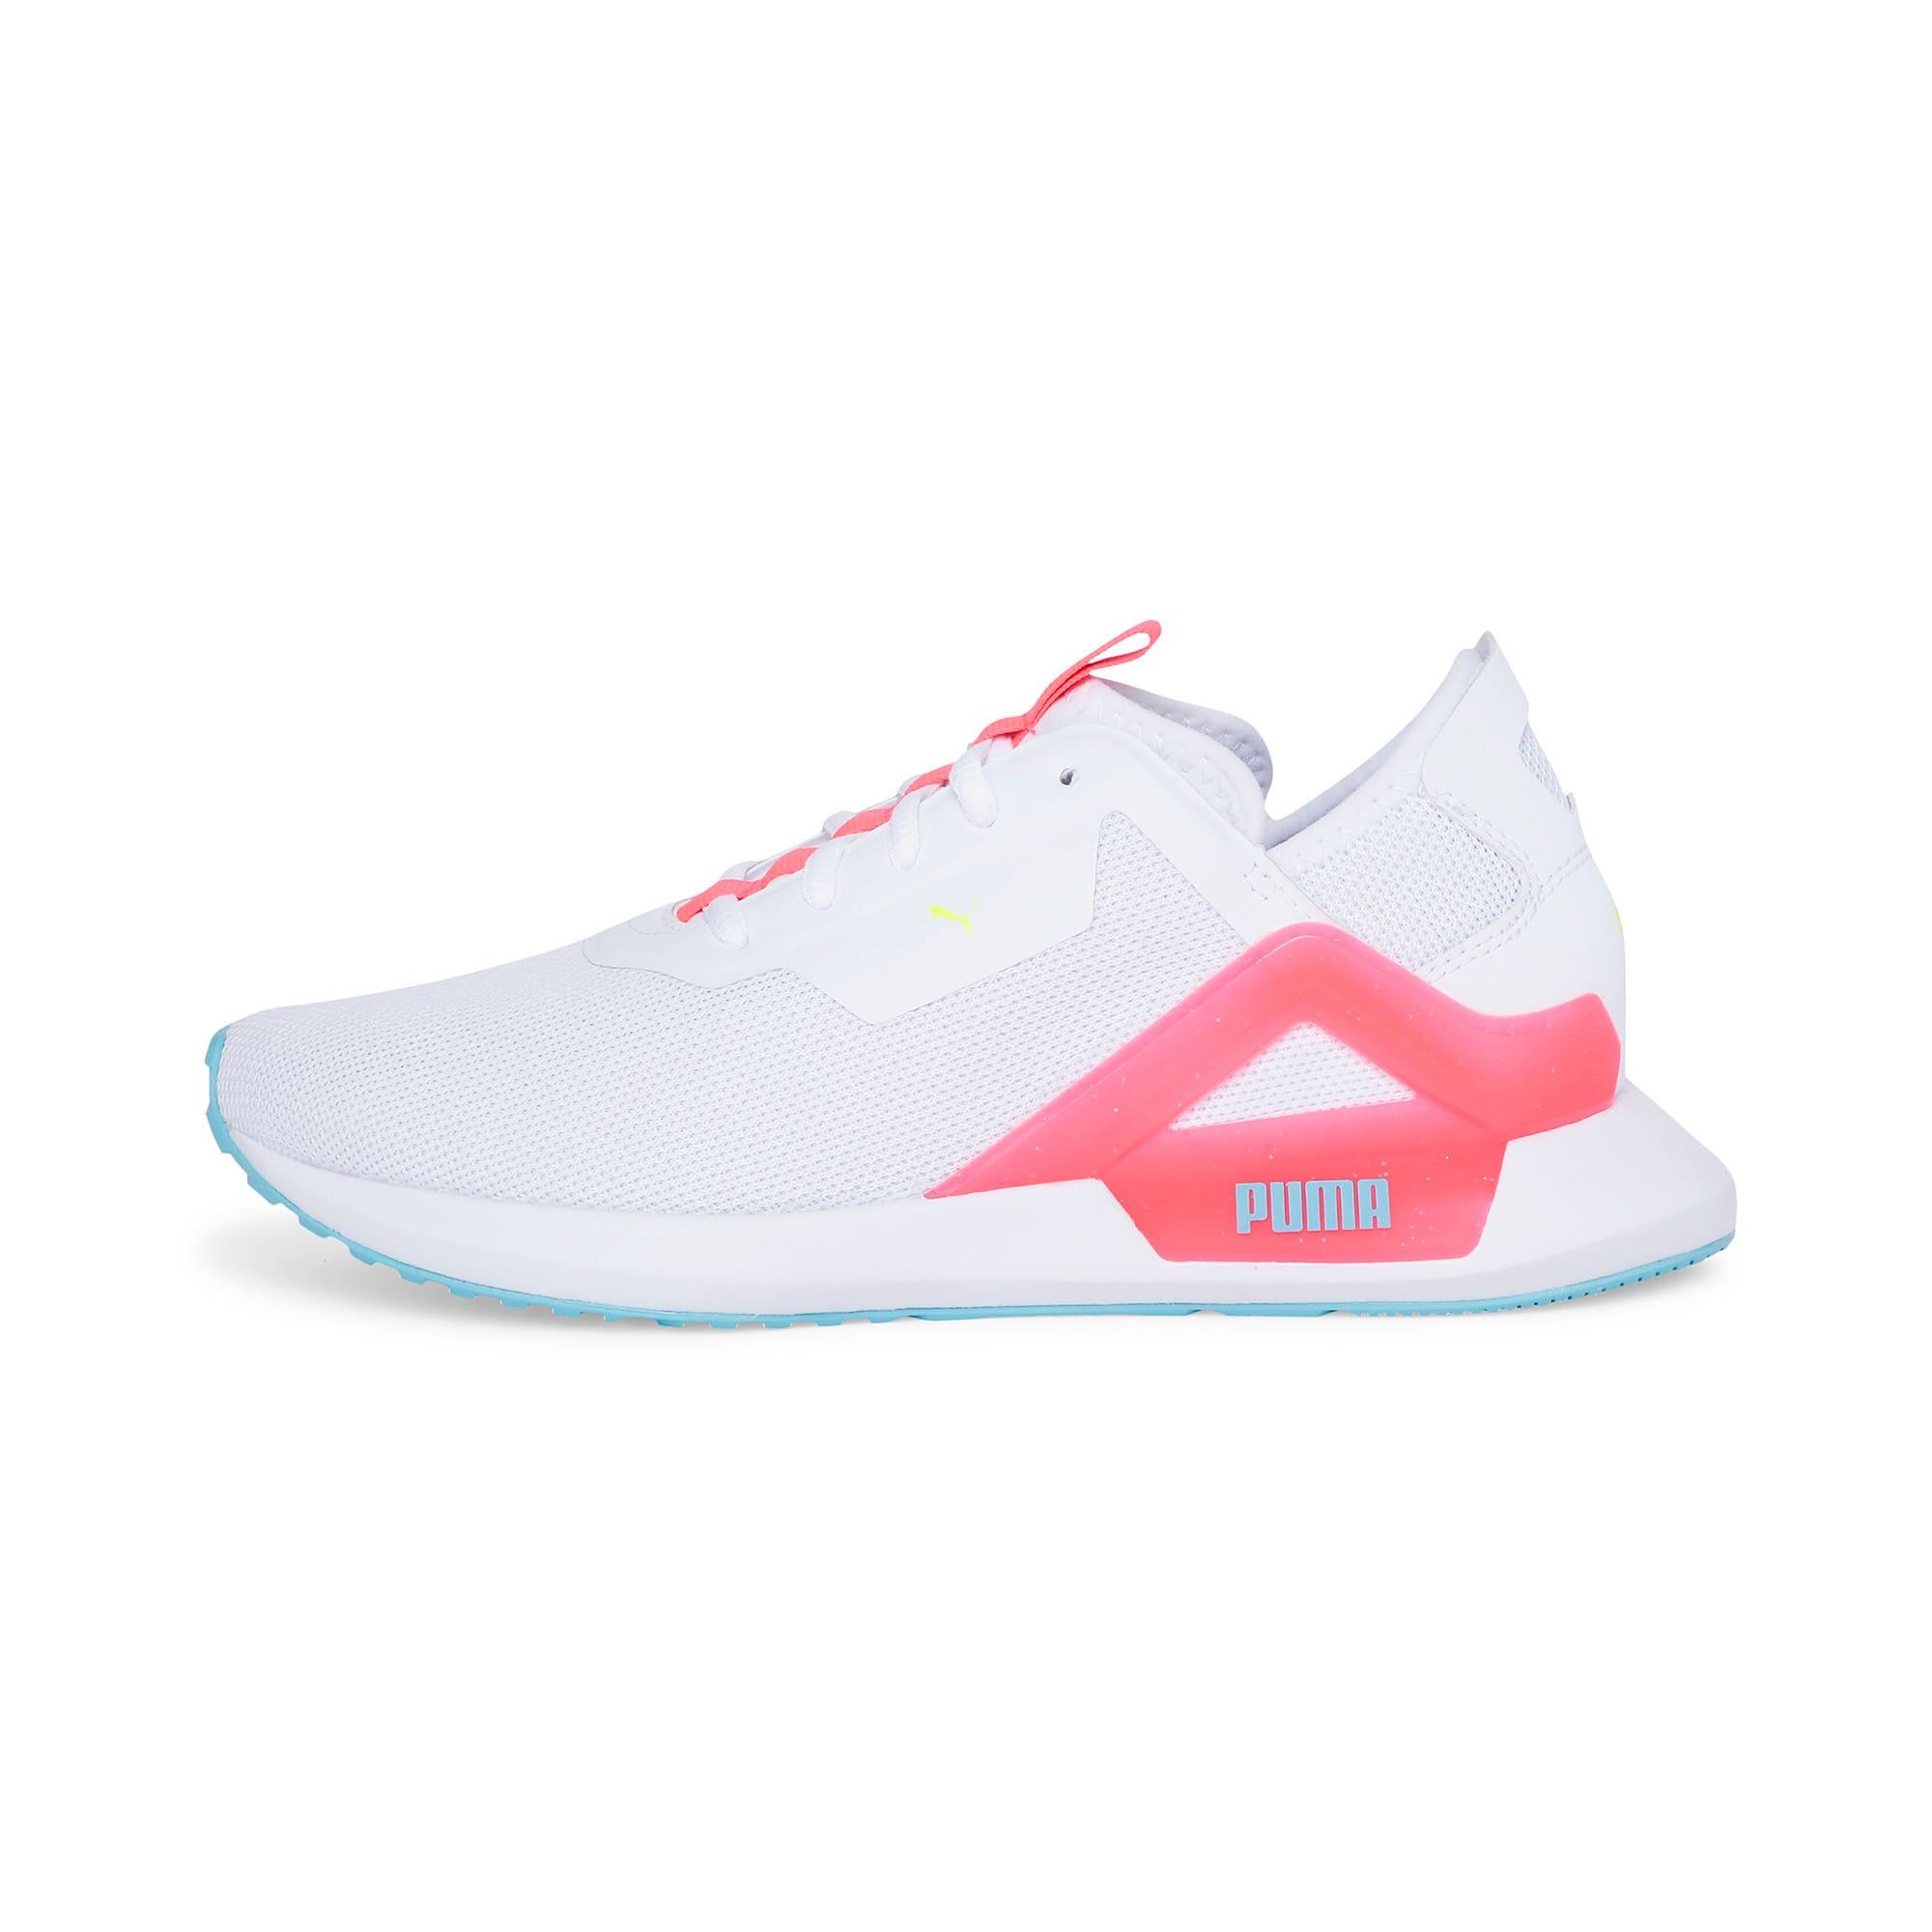 Thumbnail 1 of Rogue X Knit Women's Running Shoes, Puma White-Pink Alert, medium-IND